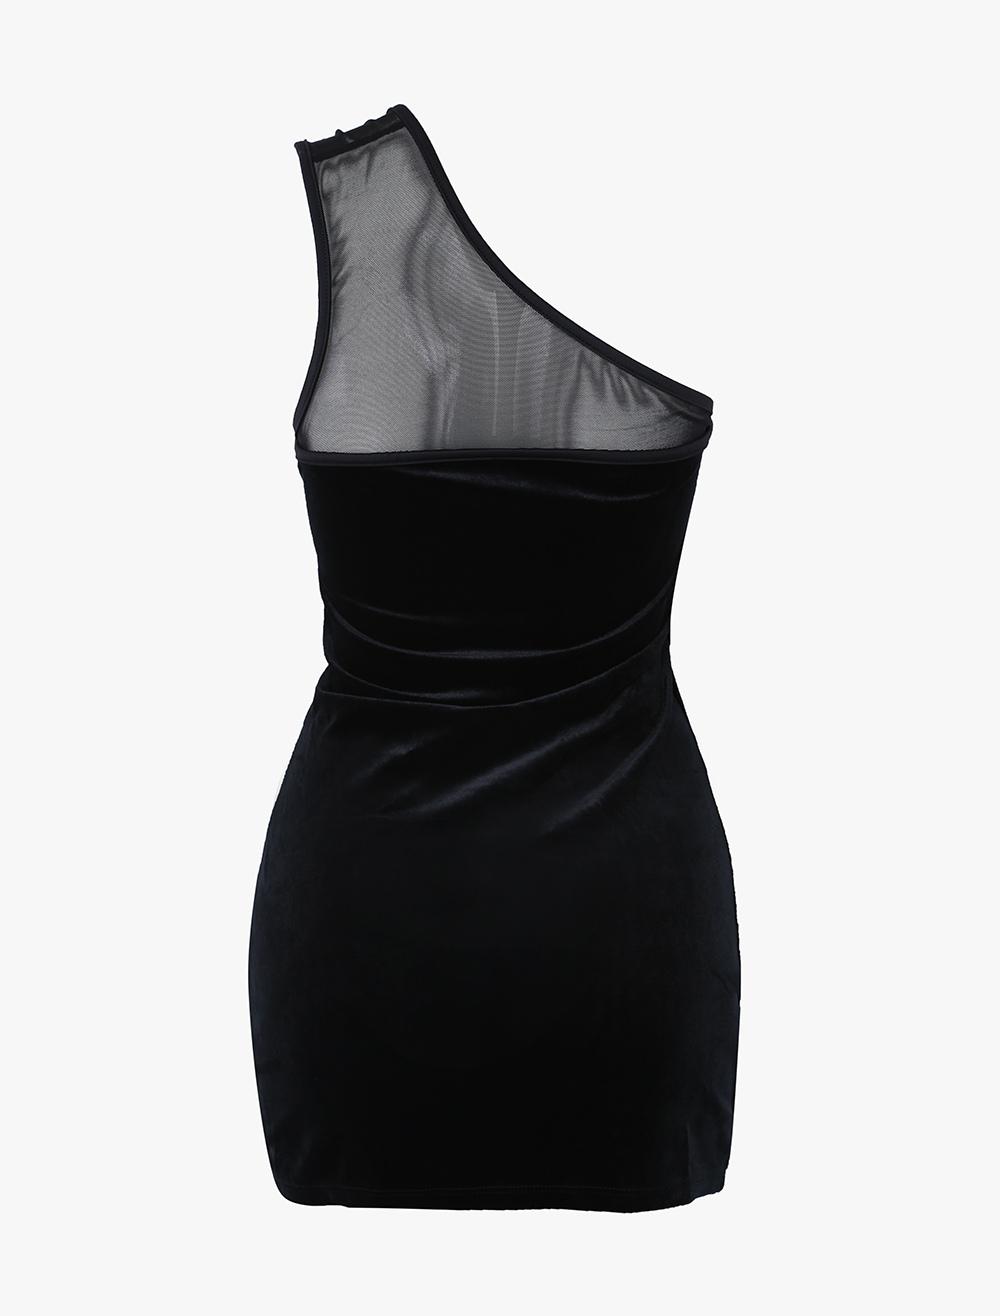 Black One Shoulder Sexy Velvet Women's Corset Dress